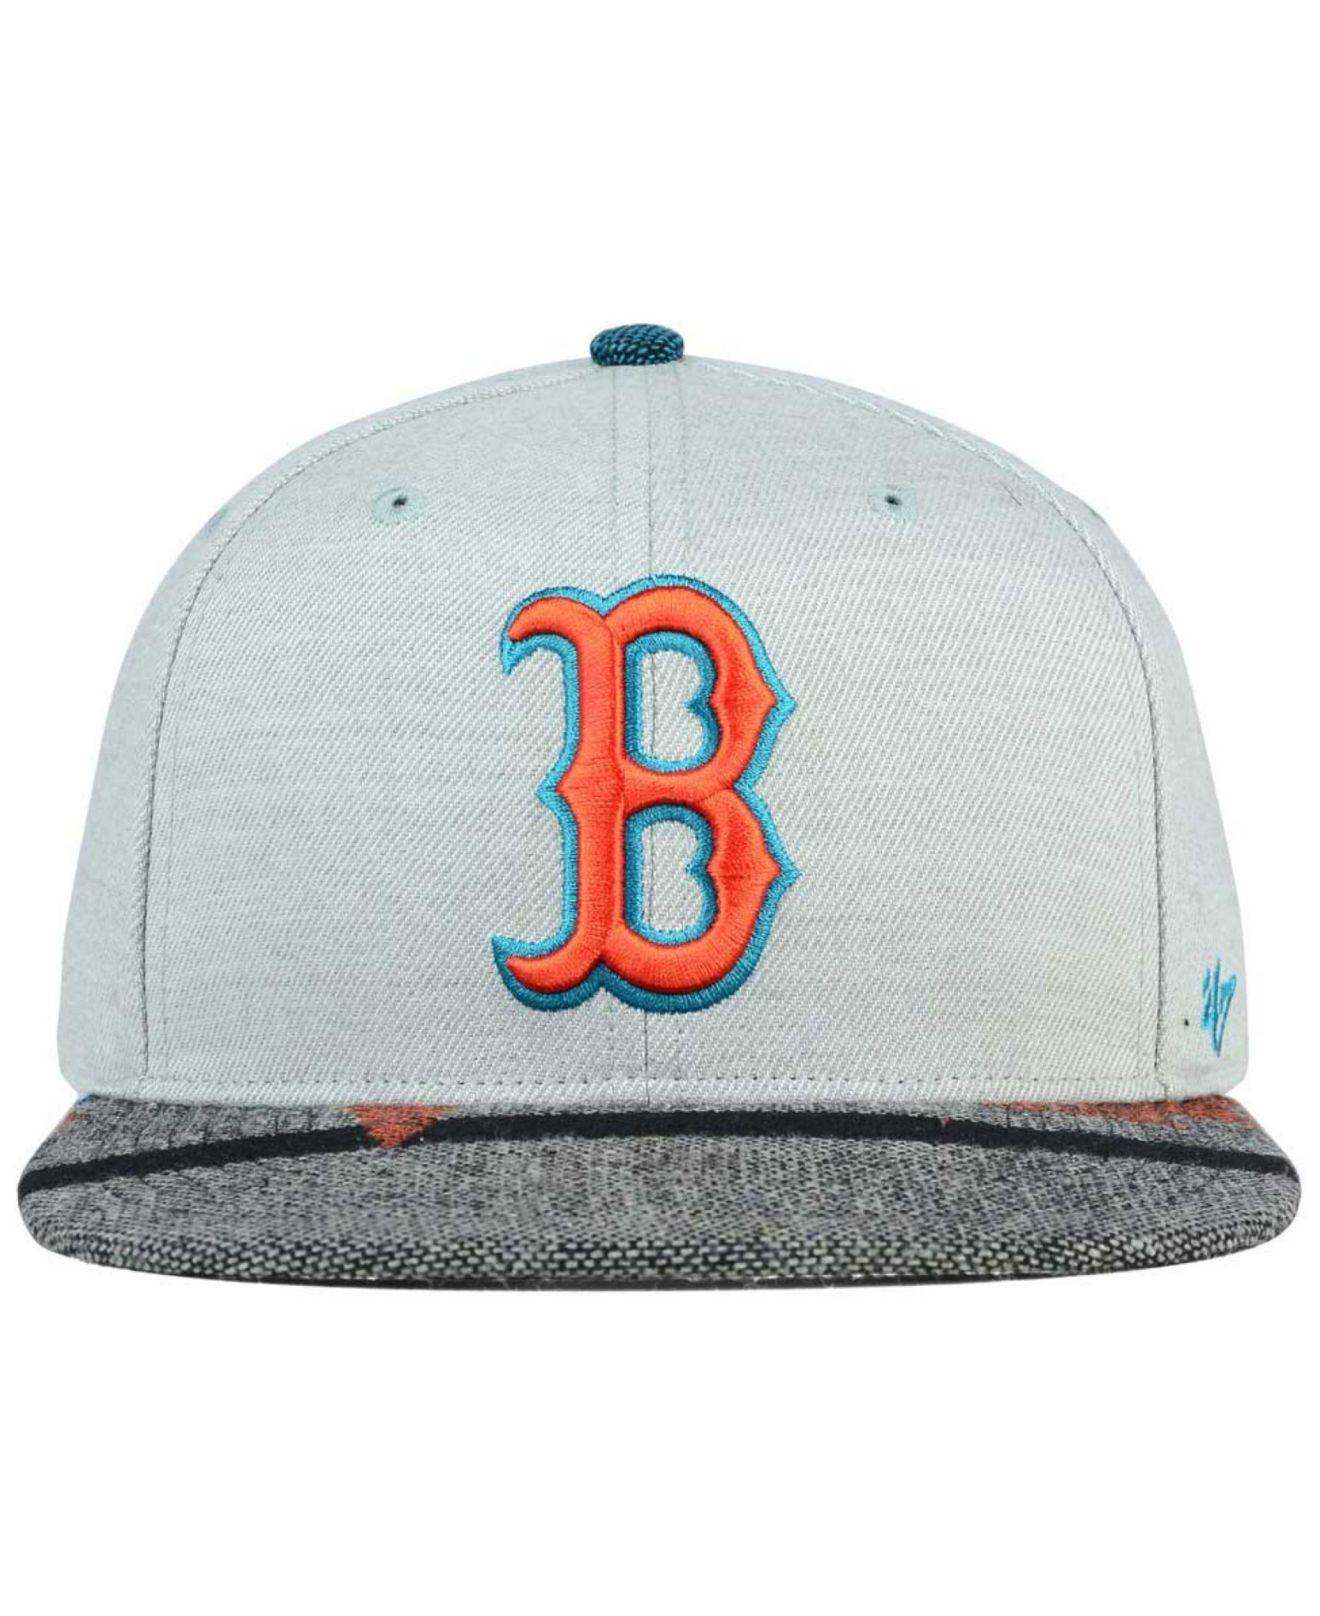 d576ec60059ab Lyst - 47 Brand Boston Red Sox Armadillo Snapback Cap in Gray for Men